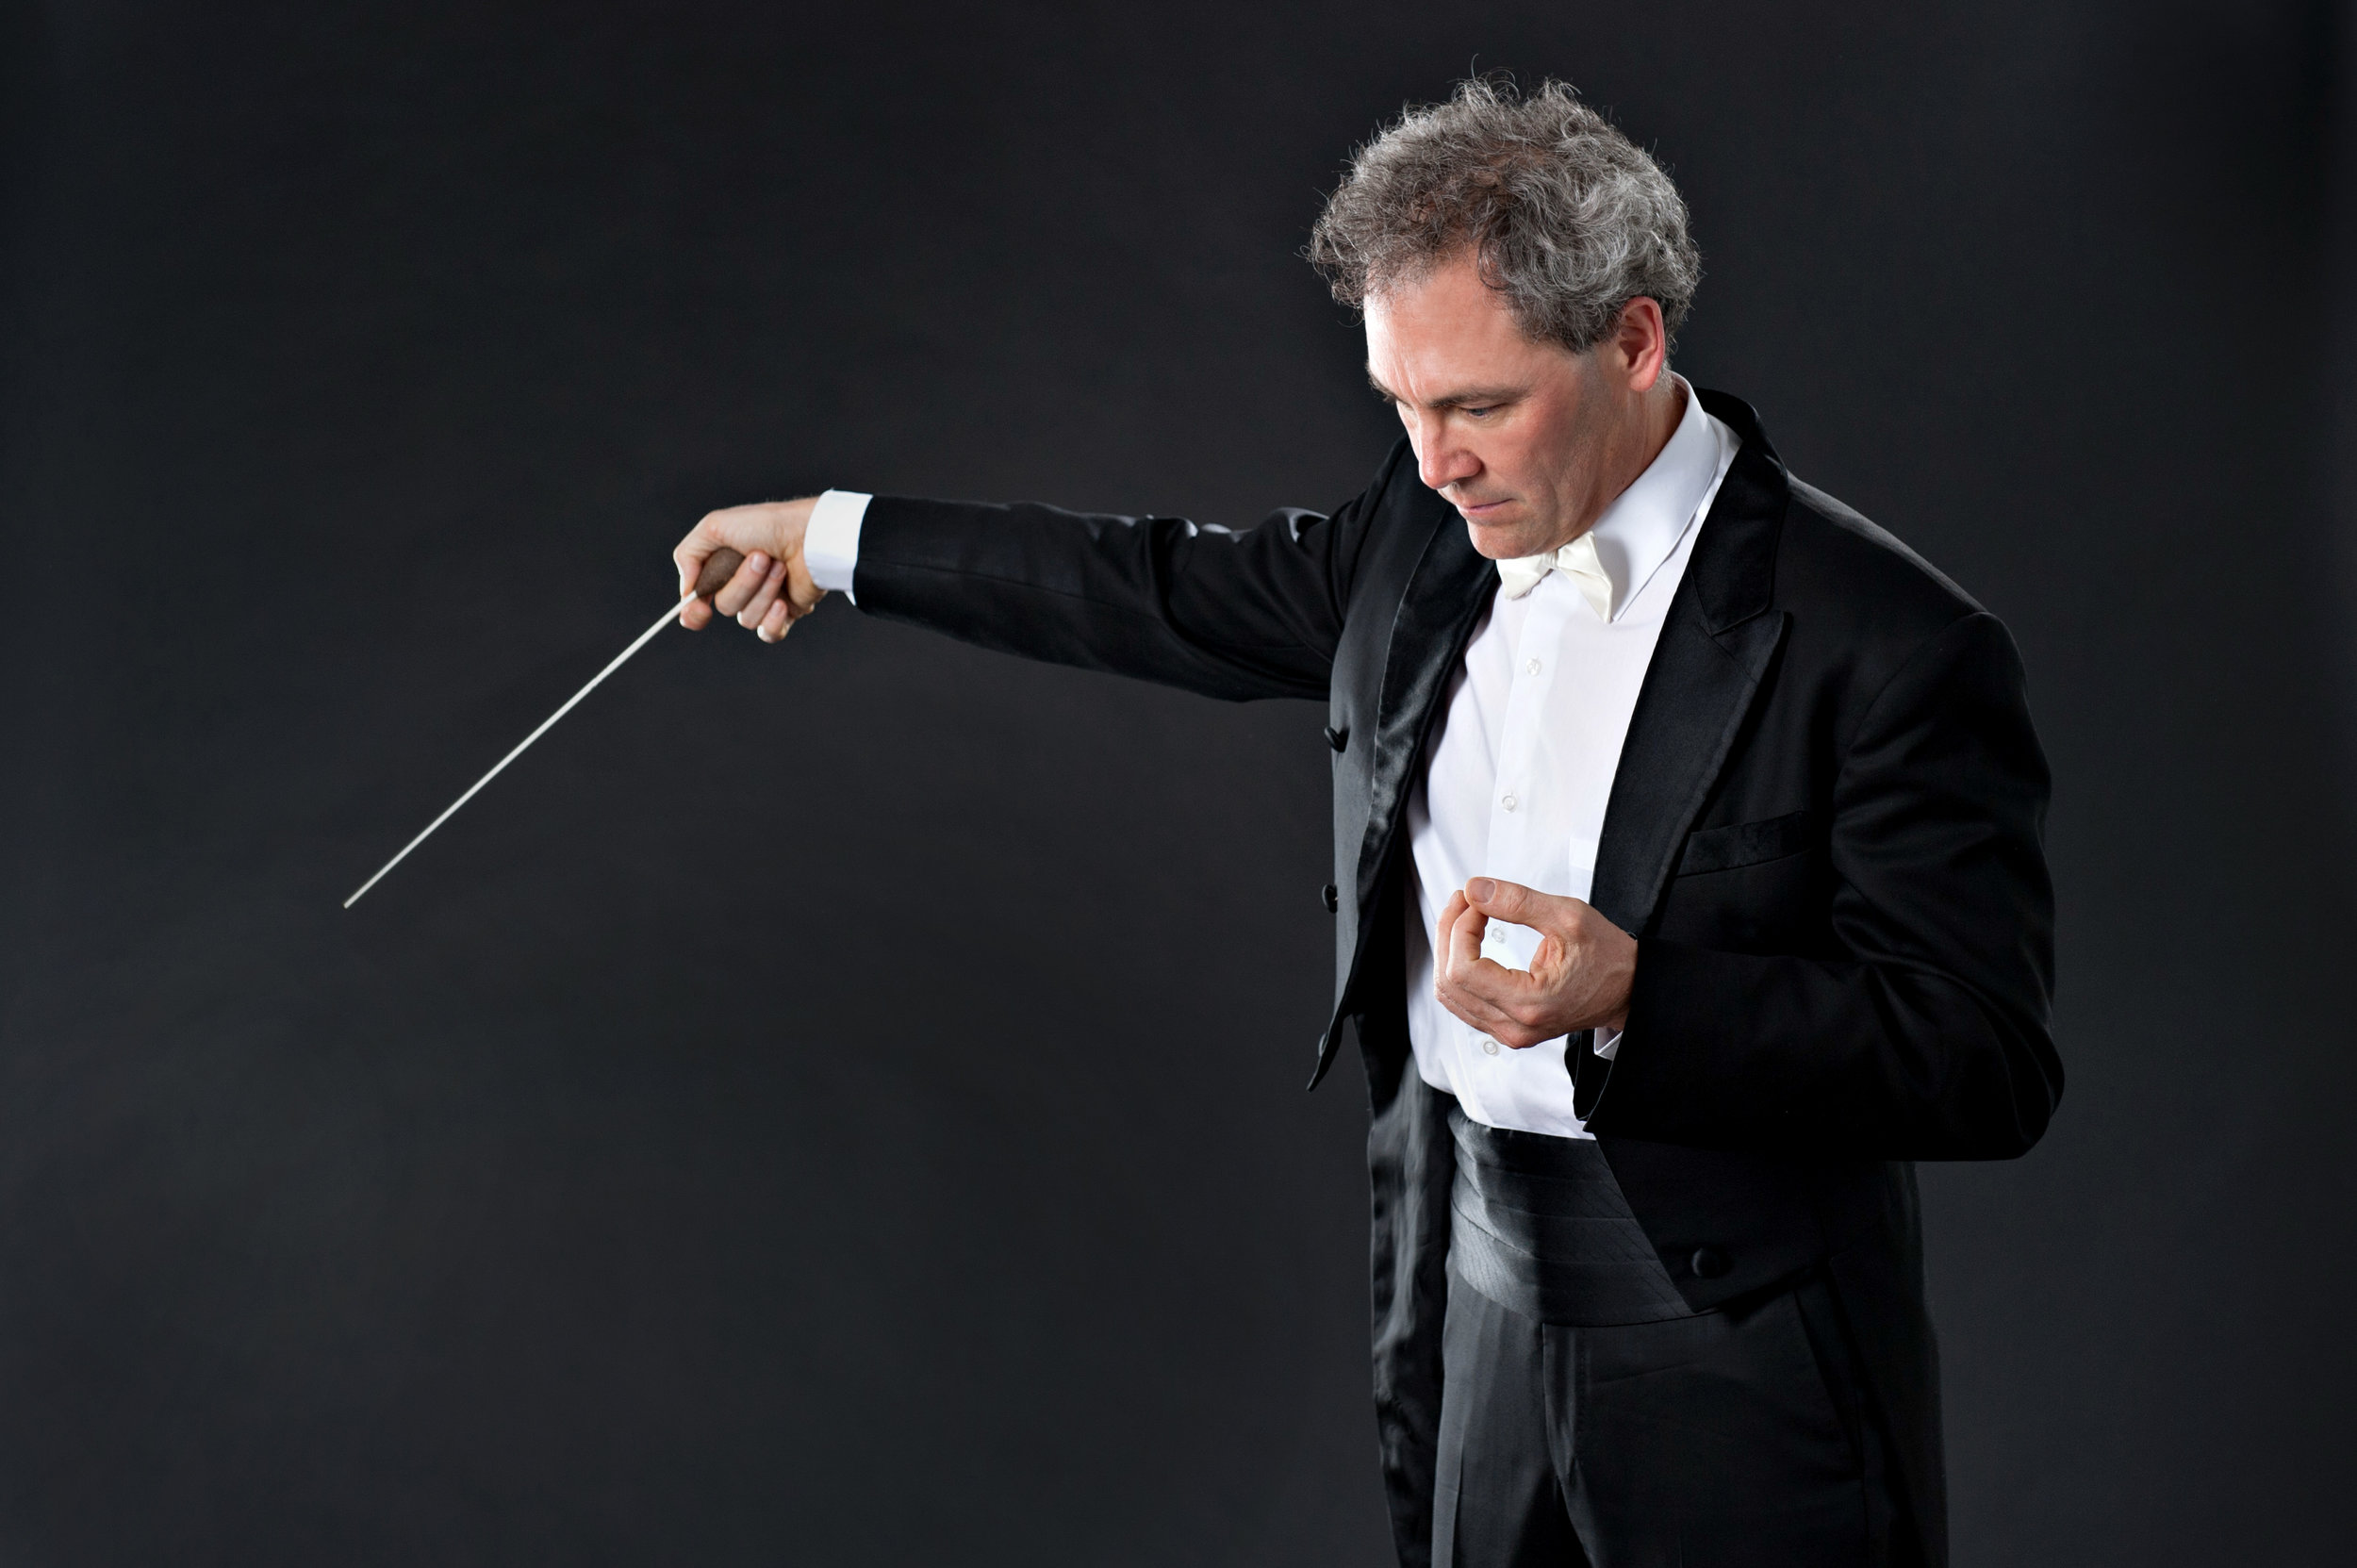 Marta-Hewson-editorial-portraits-Hamilton-Philharmonic-Orchestra-Jamie-Sommerville.jpg